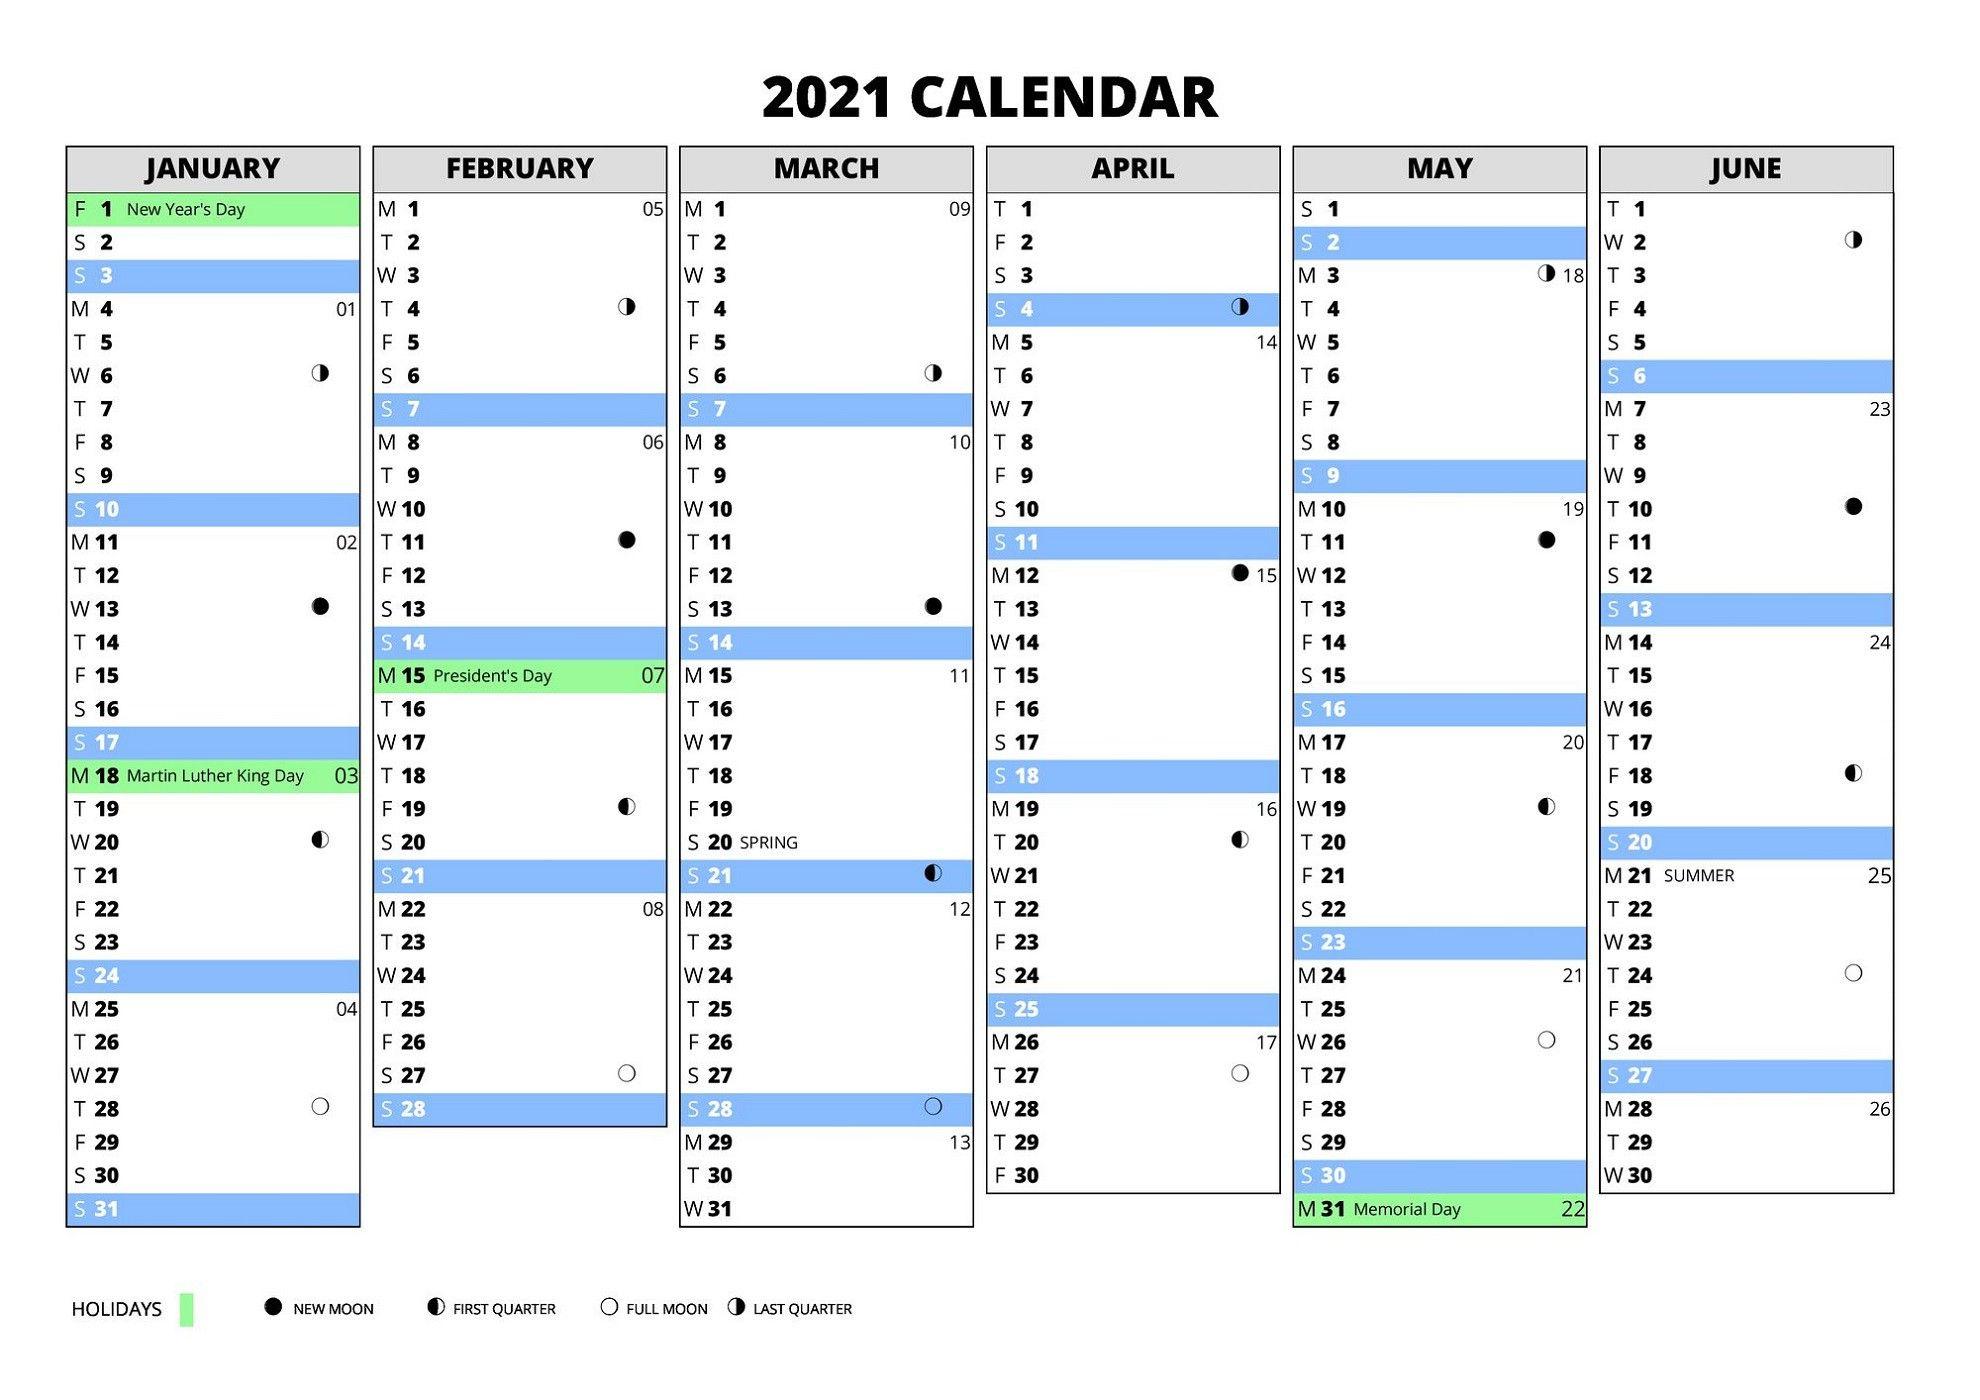 Pinjamie Hunter On Budgemom In 2020 | Excel Calendar regarding Hunting Planner 2021 Monthly